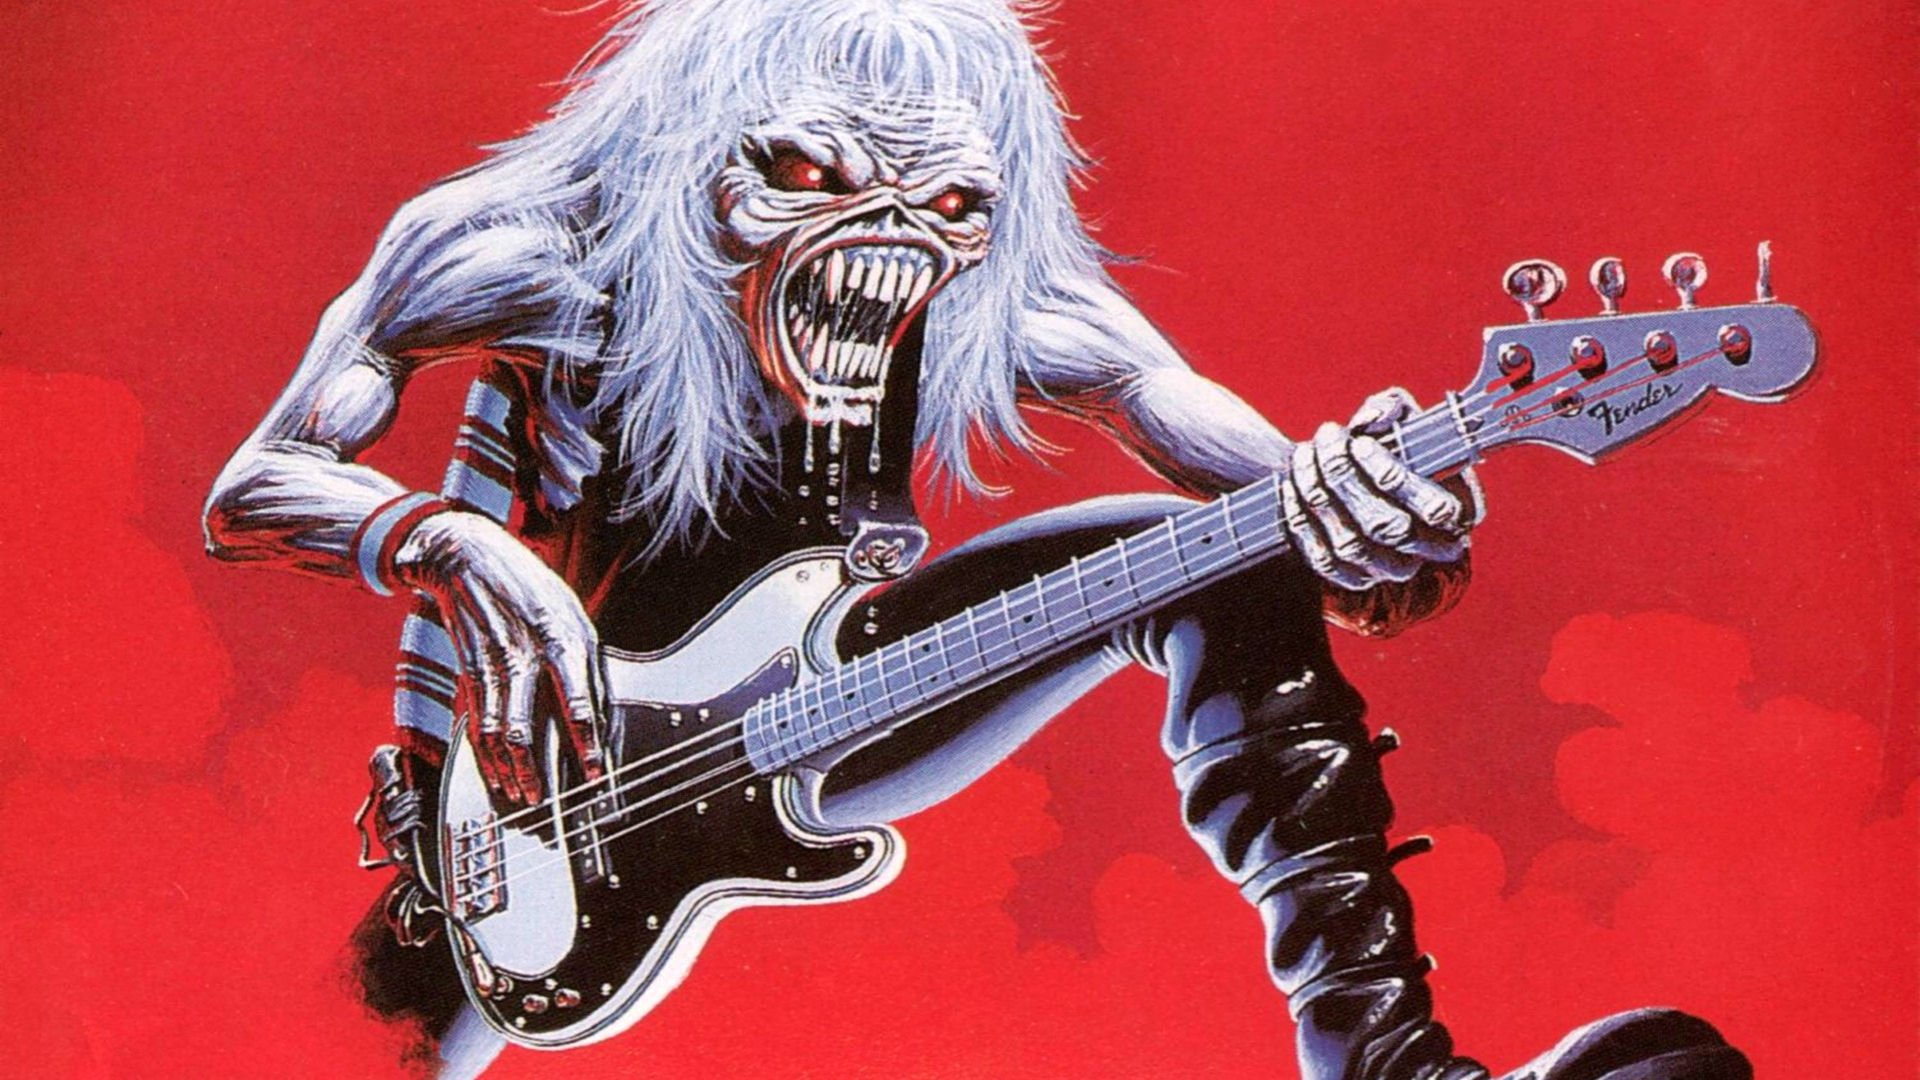 Классный картинки про рок